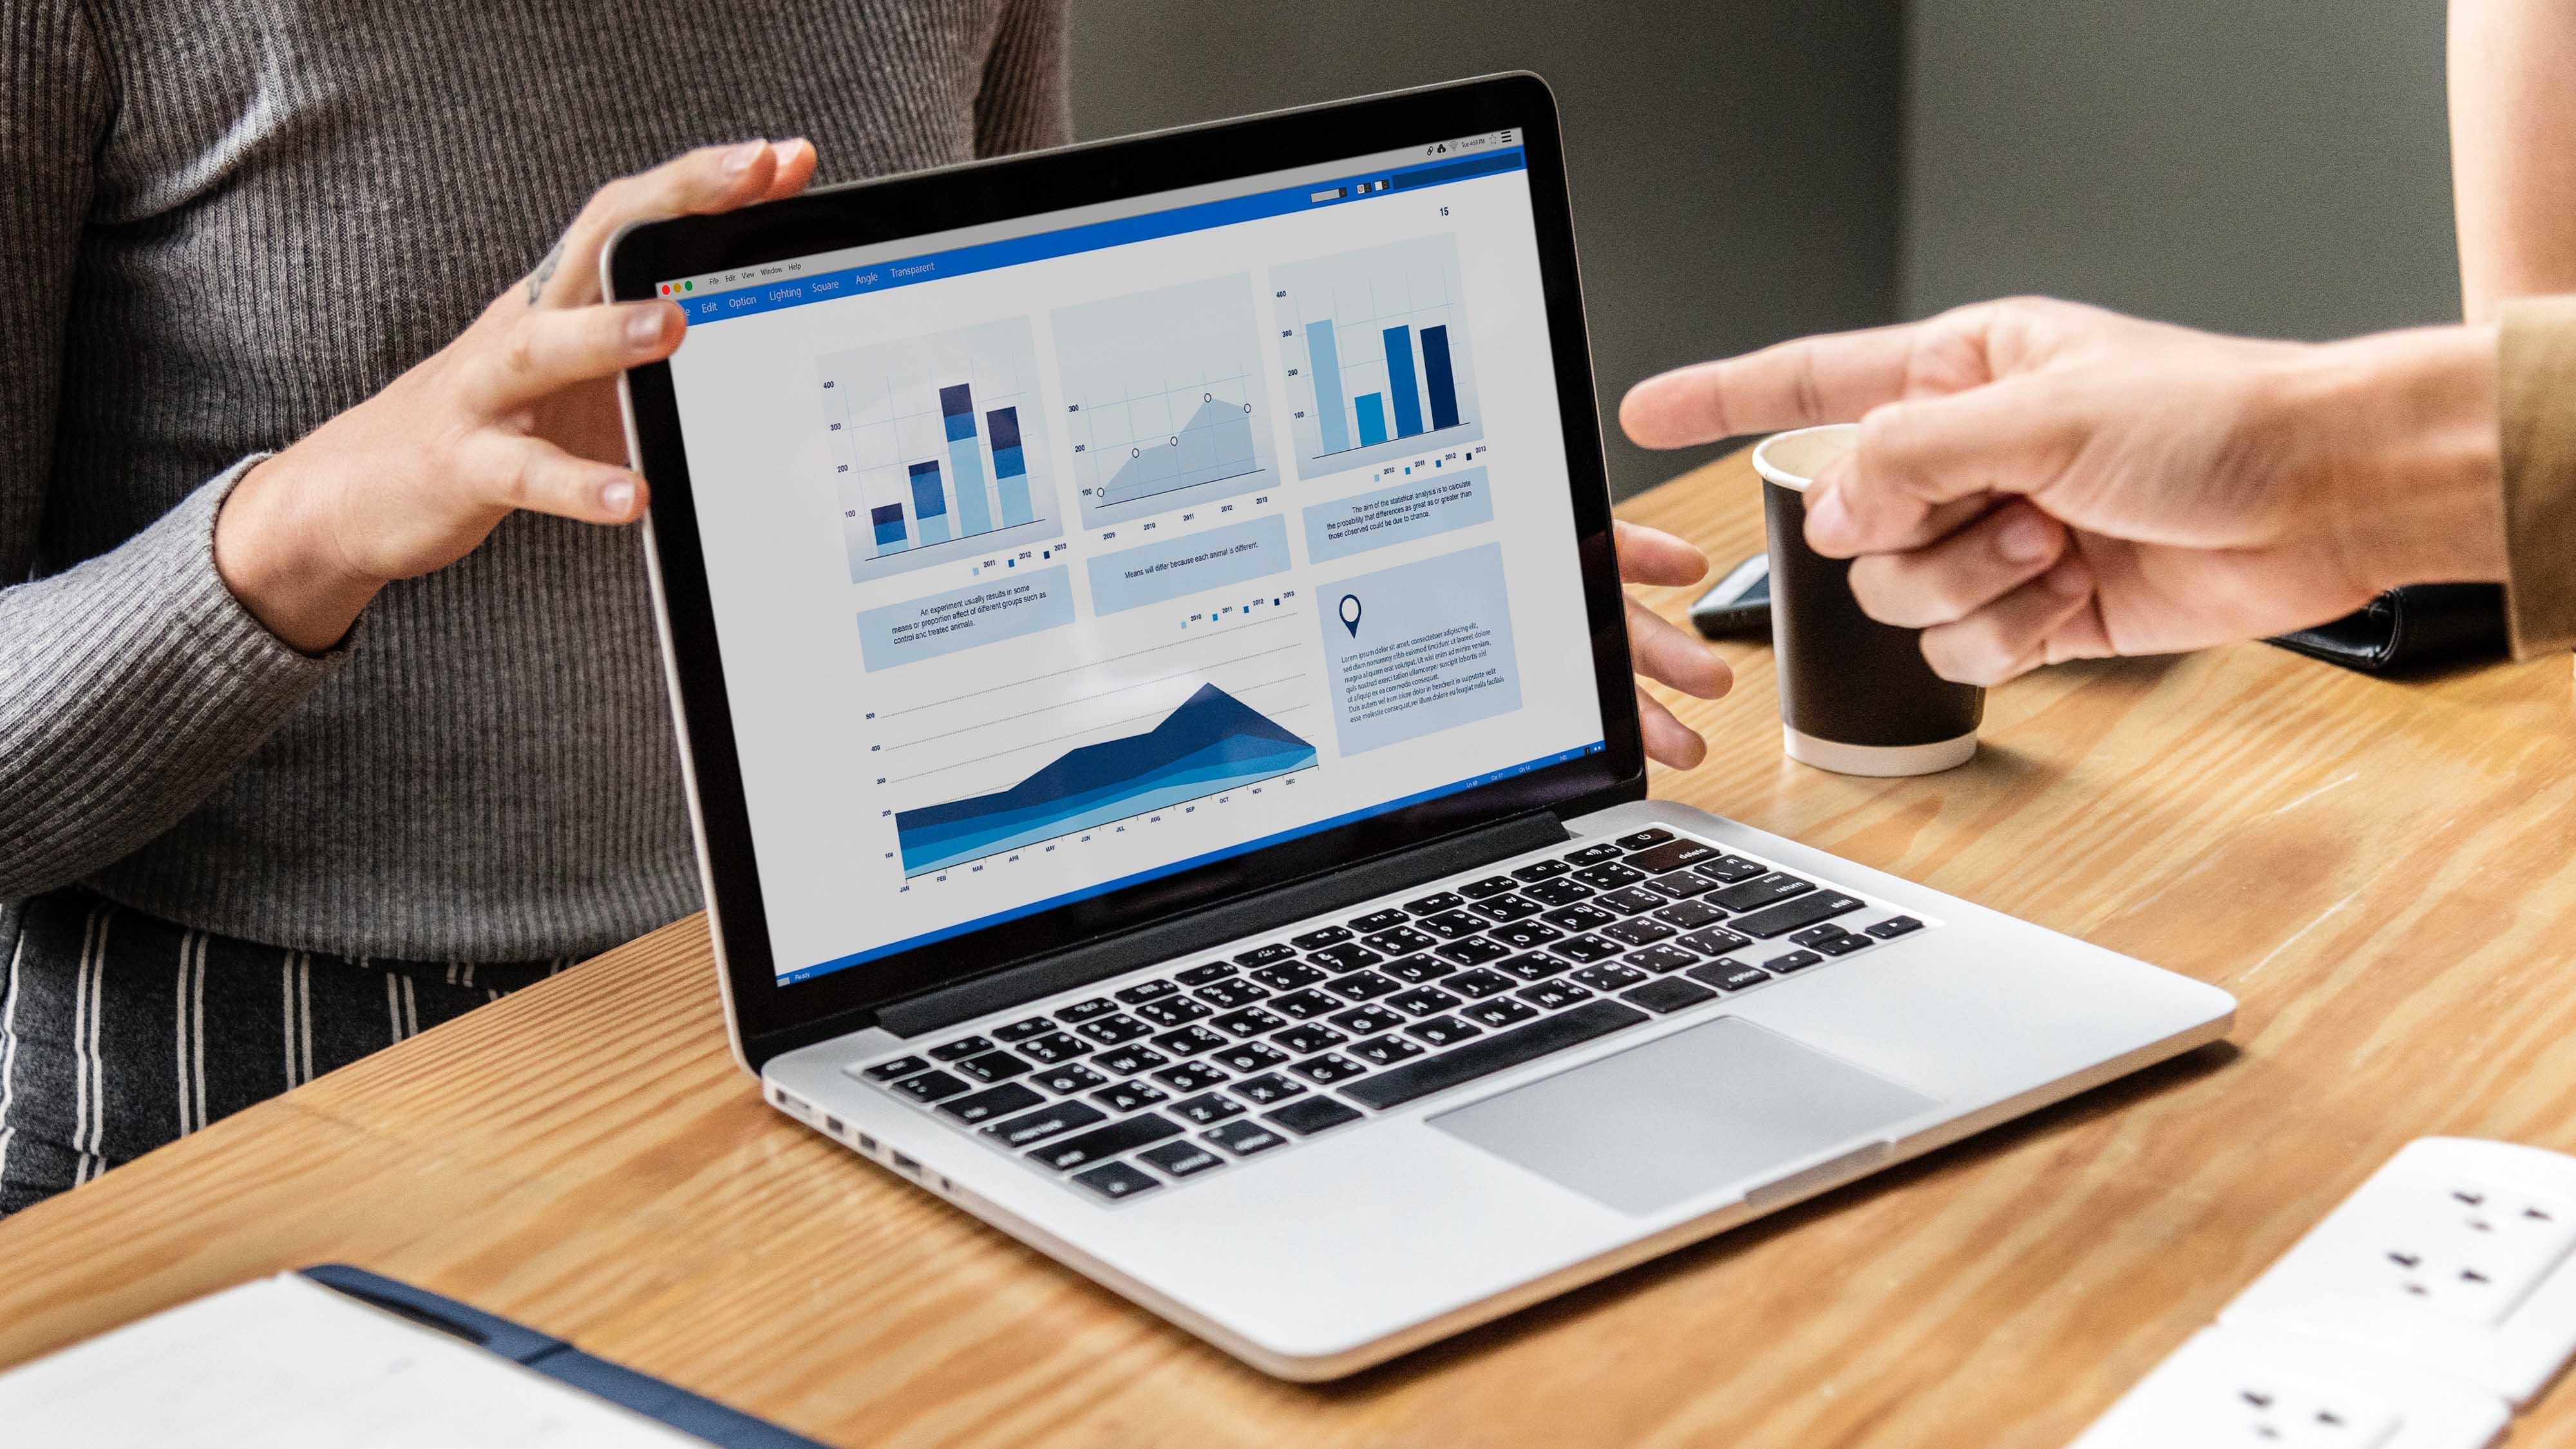 KPIS SETUP AND COMMISSIONING